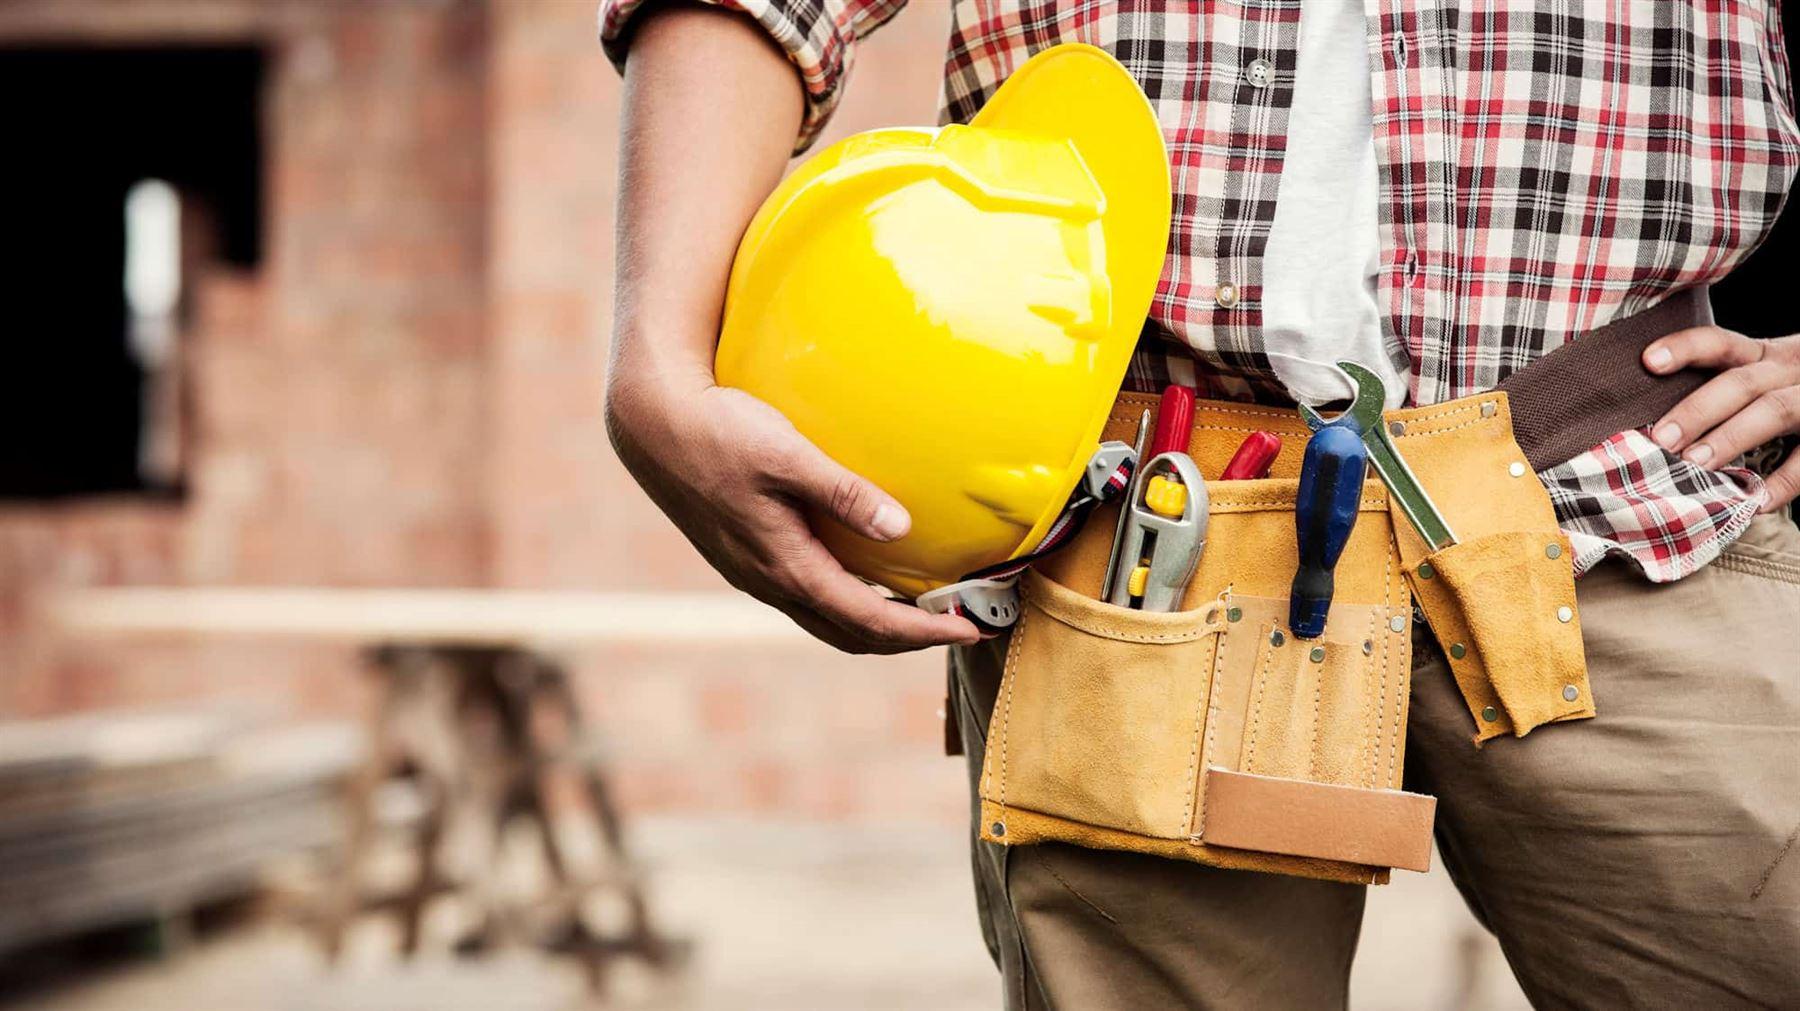 Christian Construction